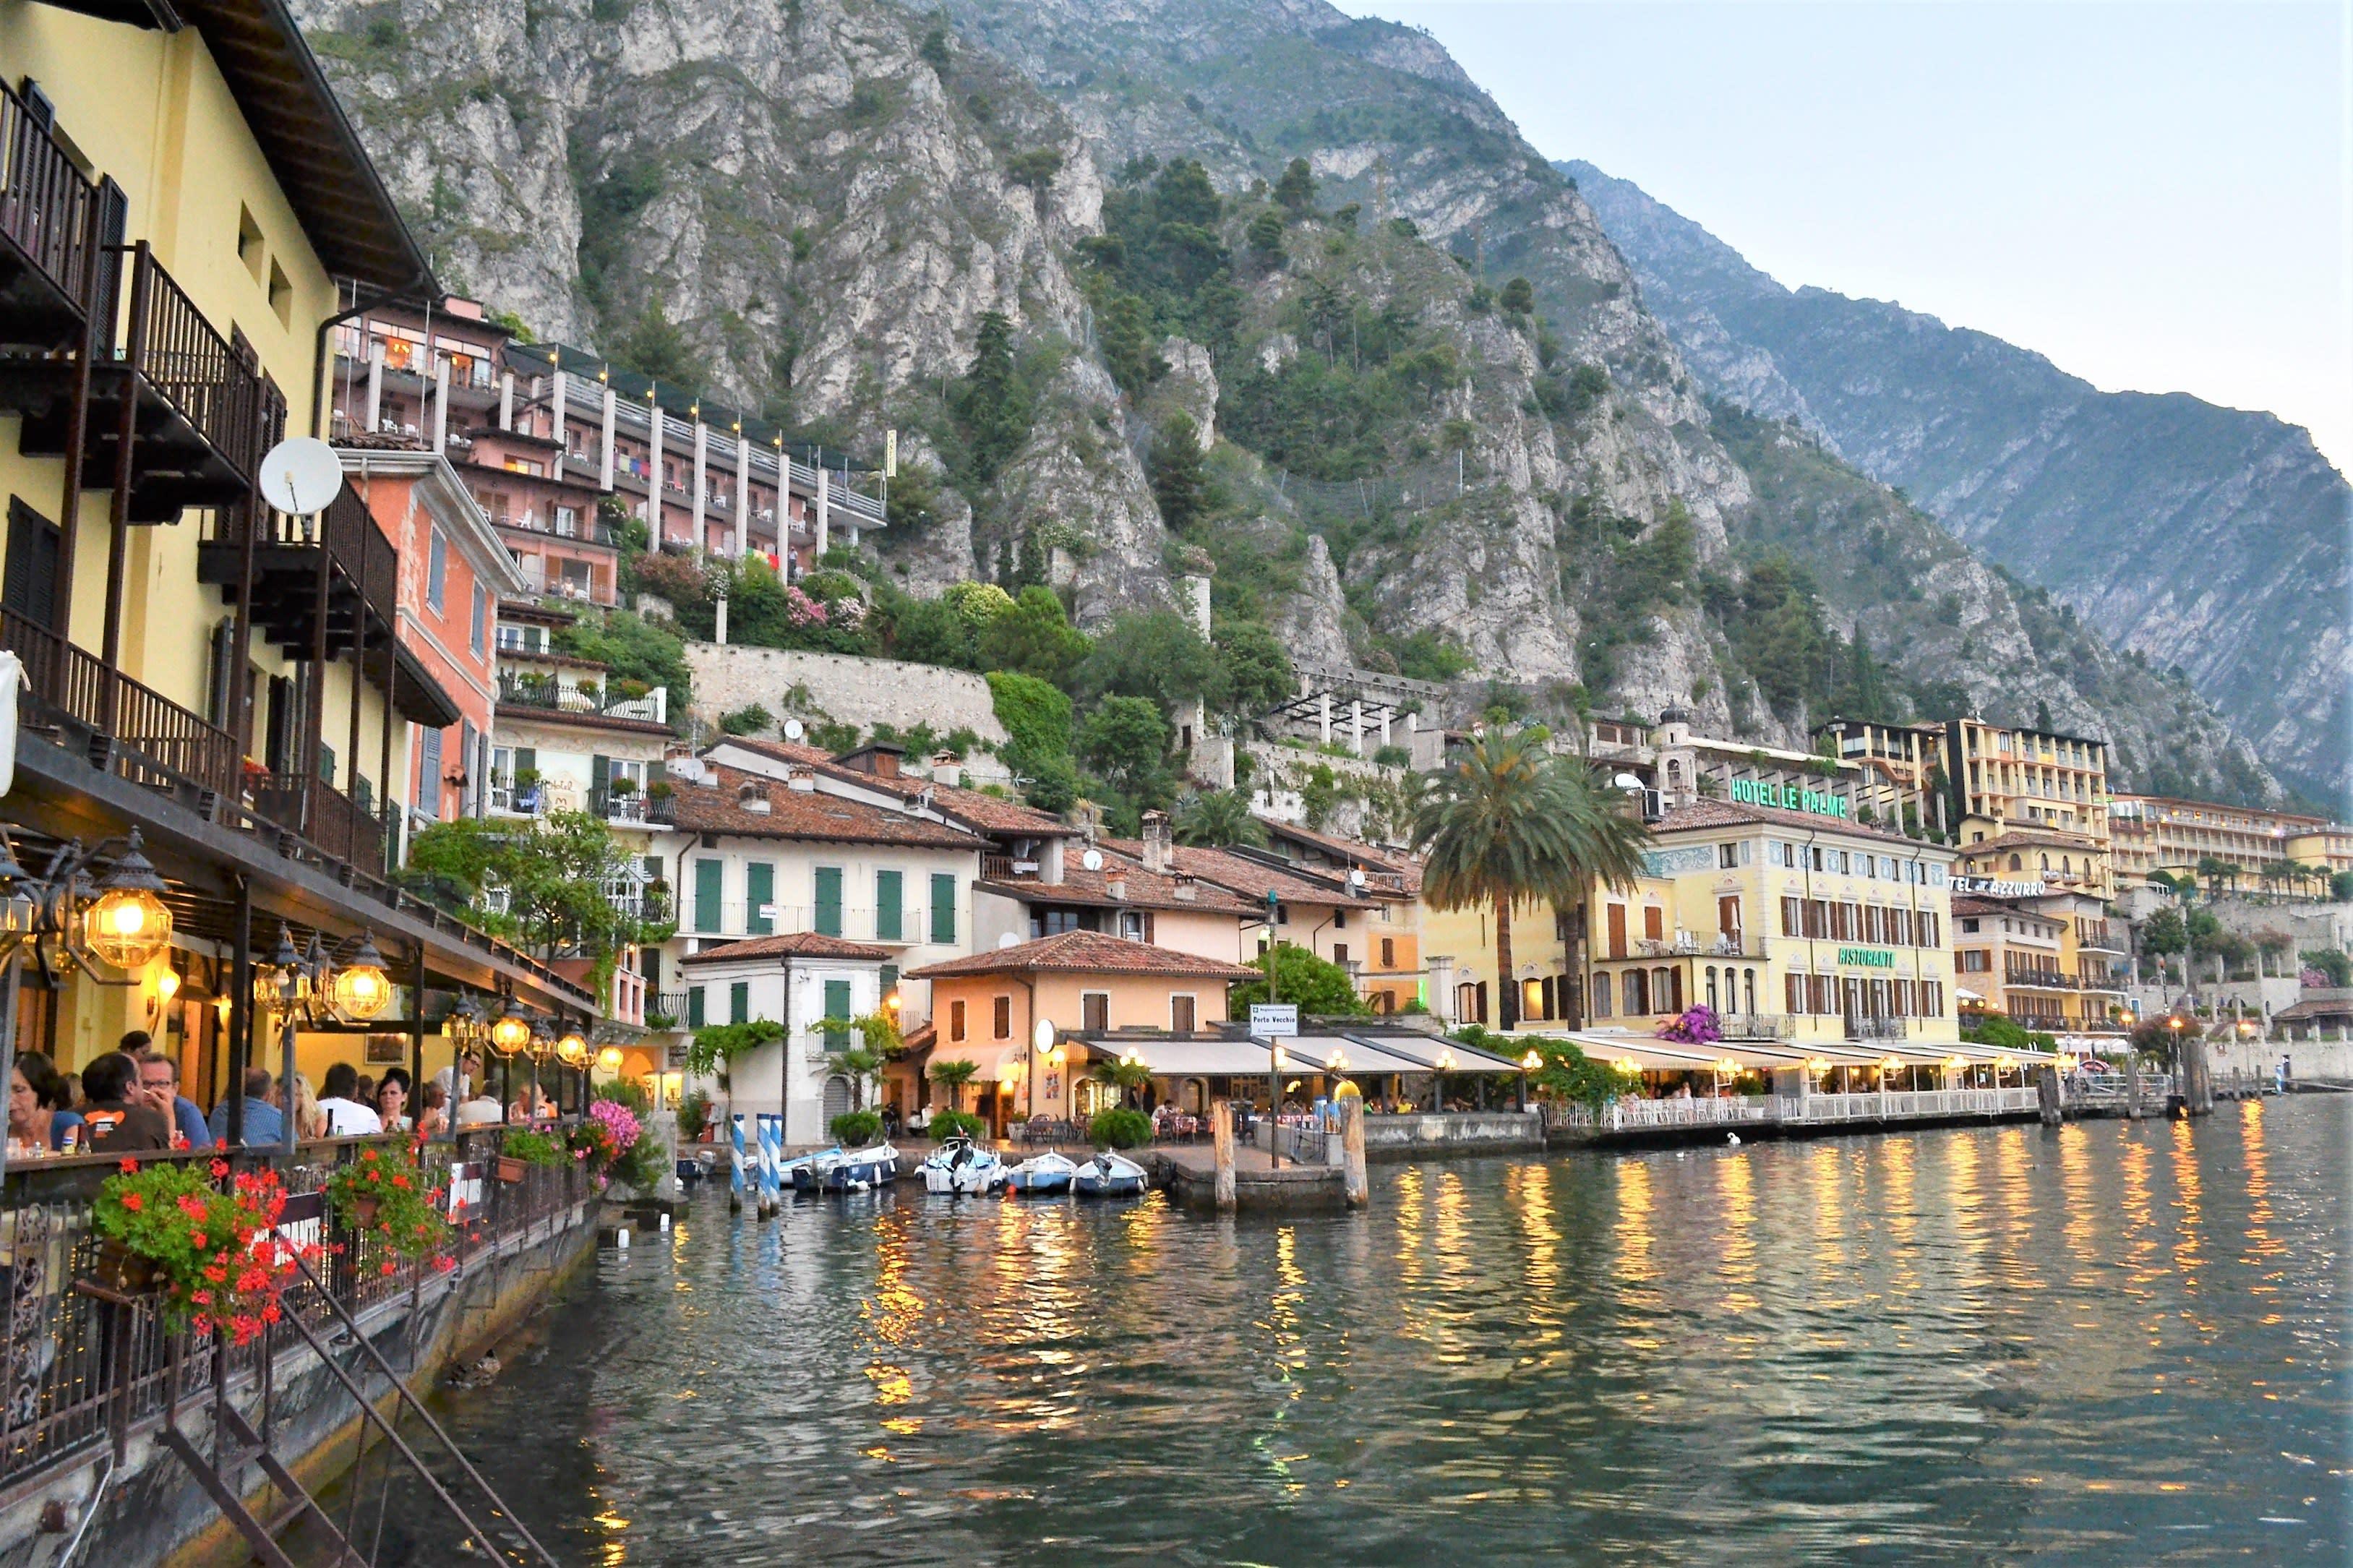 Italy Lake Garda Travel Blog Best Things To Do With Family In Lake Garda Italy